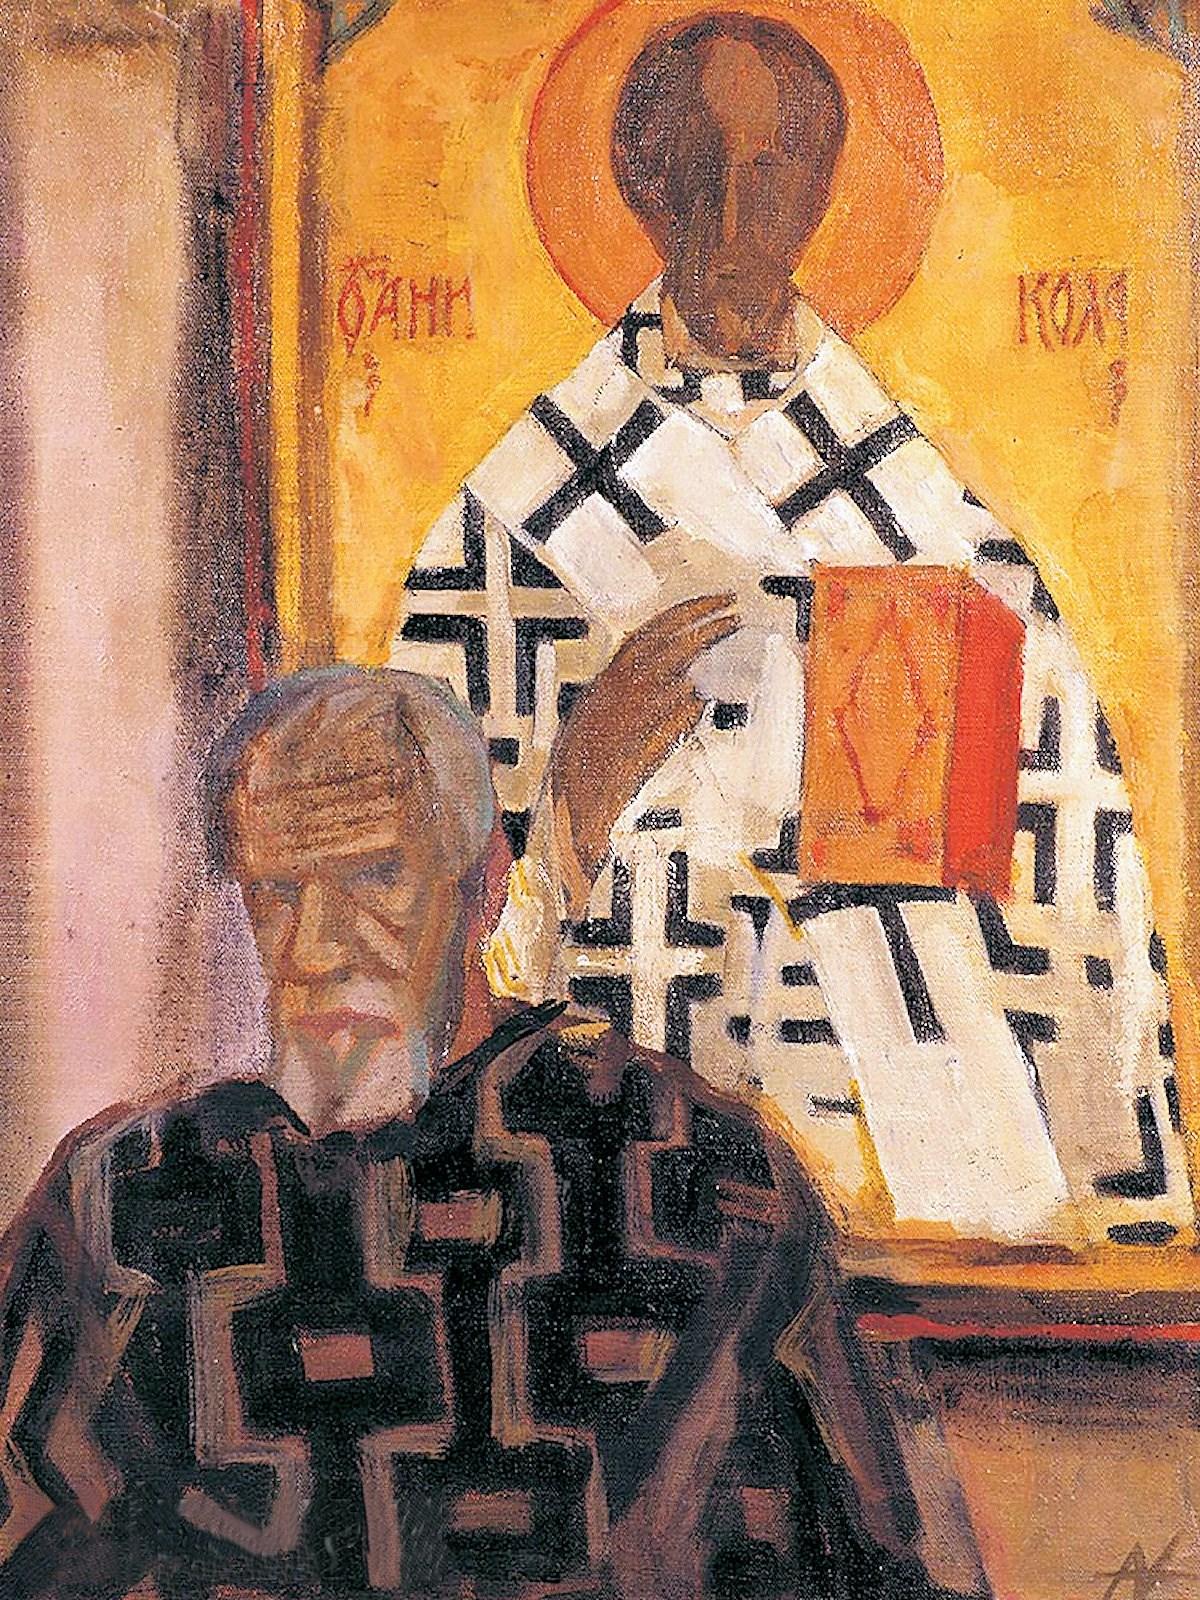 00-nikolai-andronov-self-portrait-in-the-museum-1996